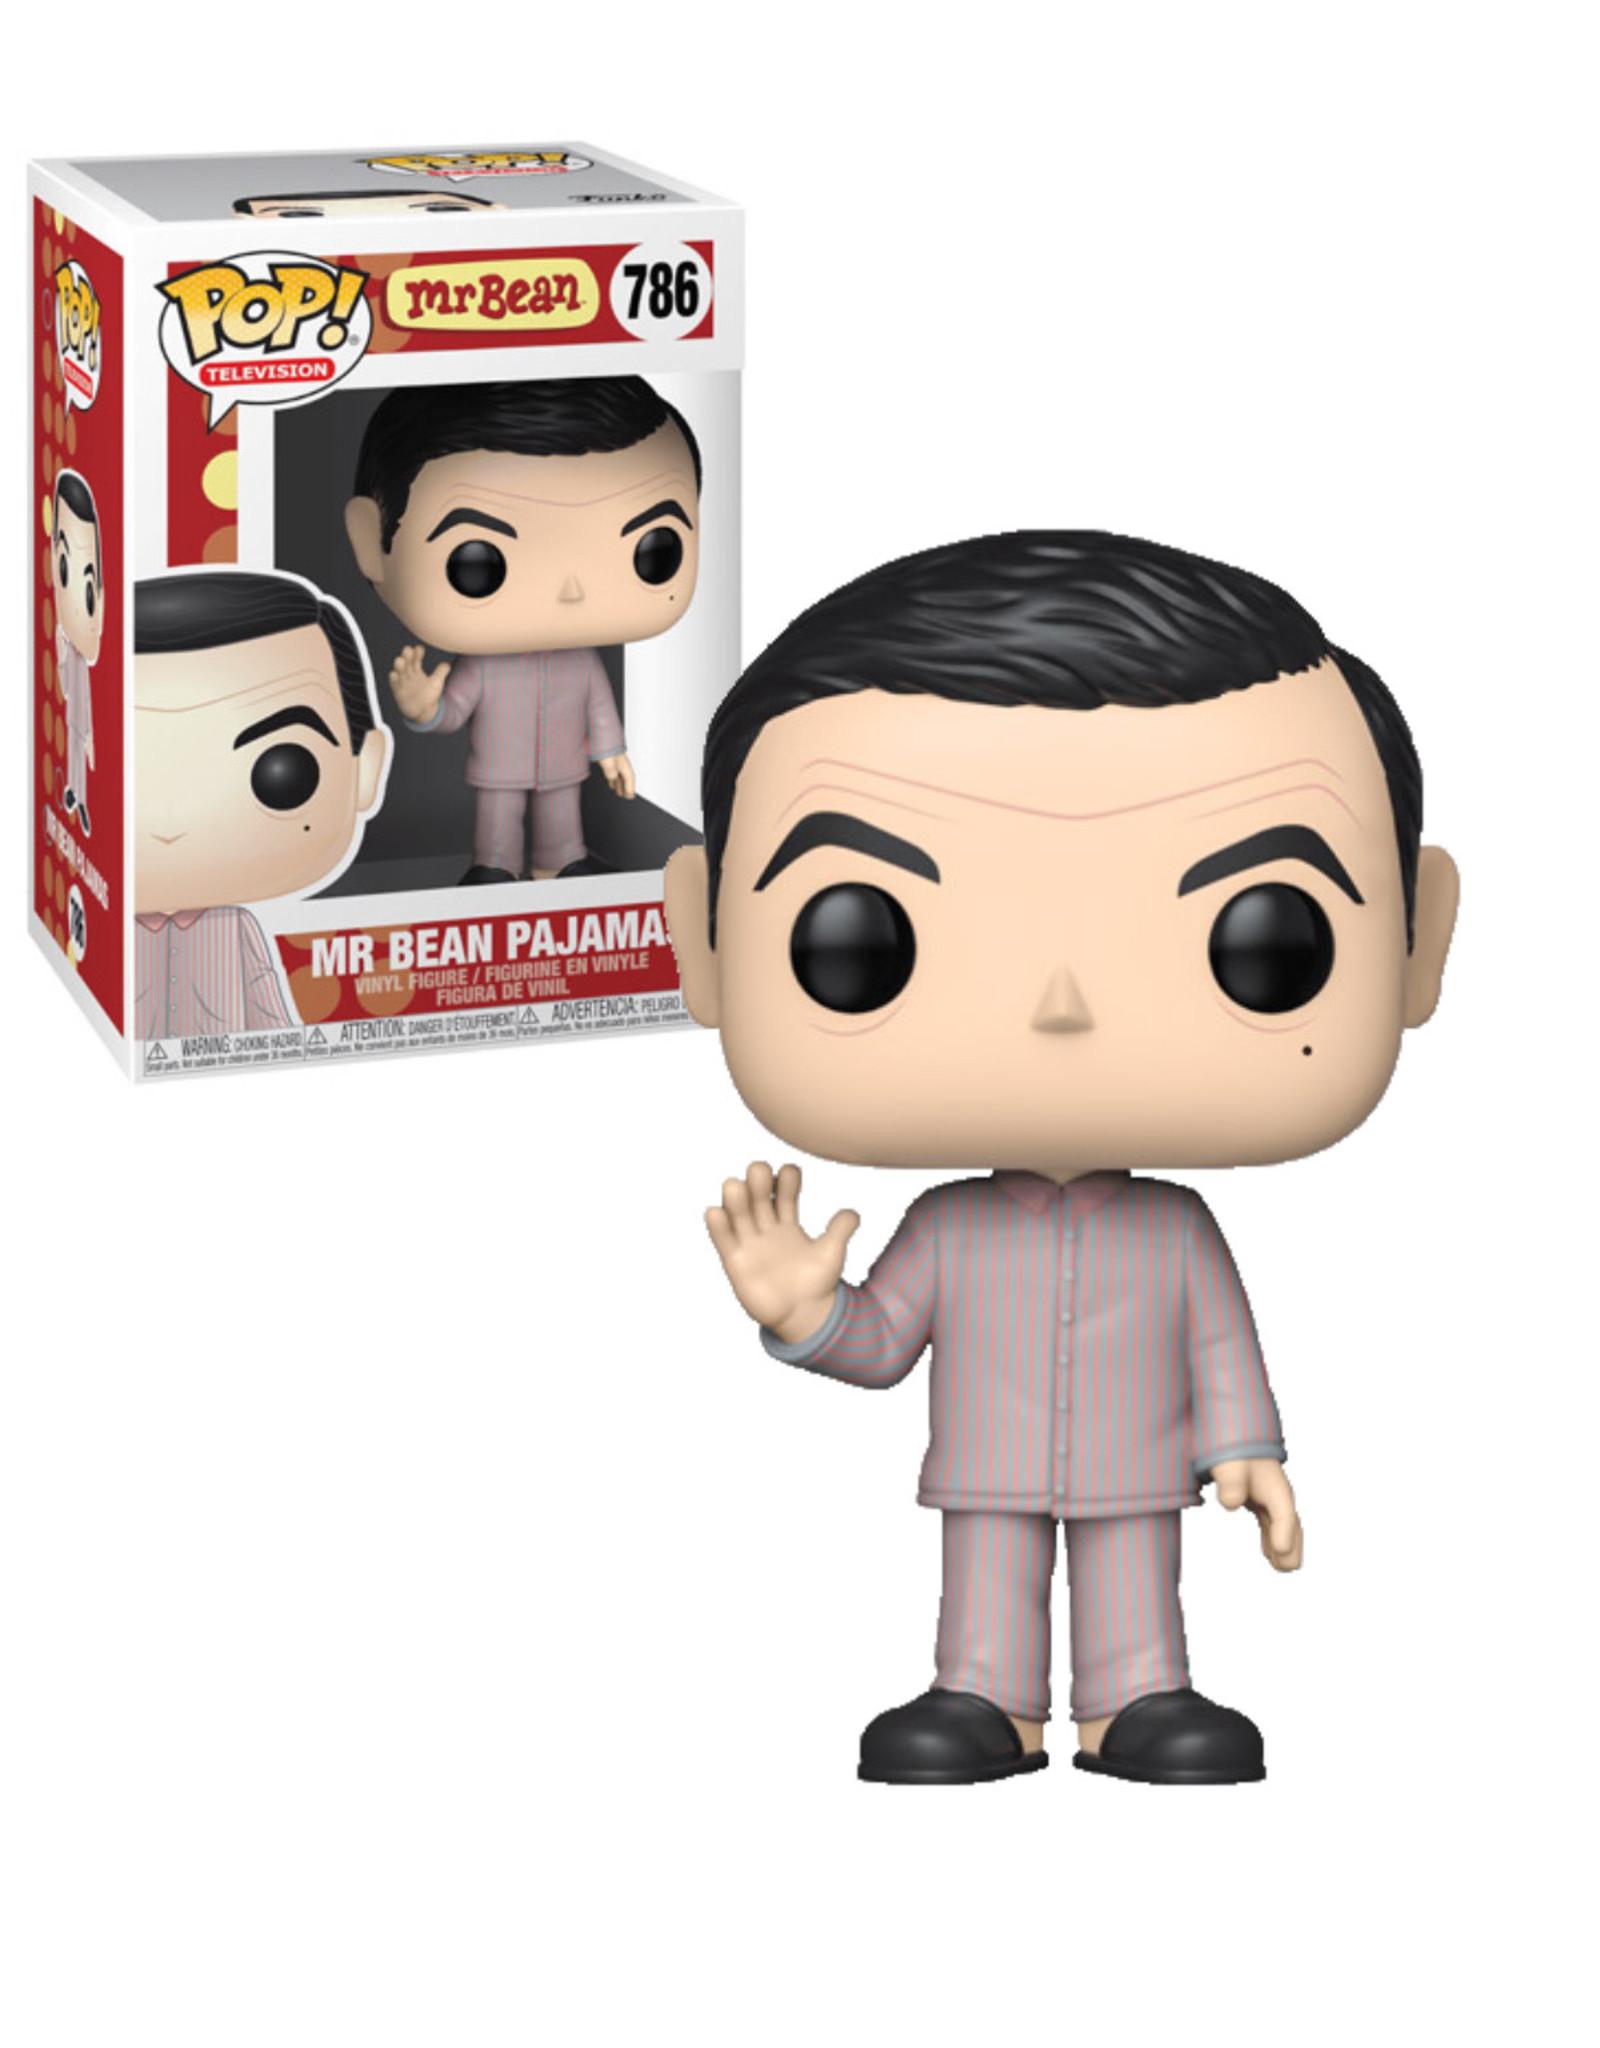 Mr. Bean 786 ( Funko Pop ) Mr Bean Pajama